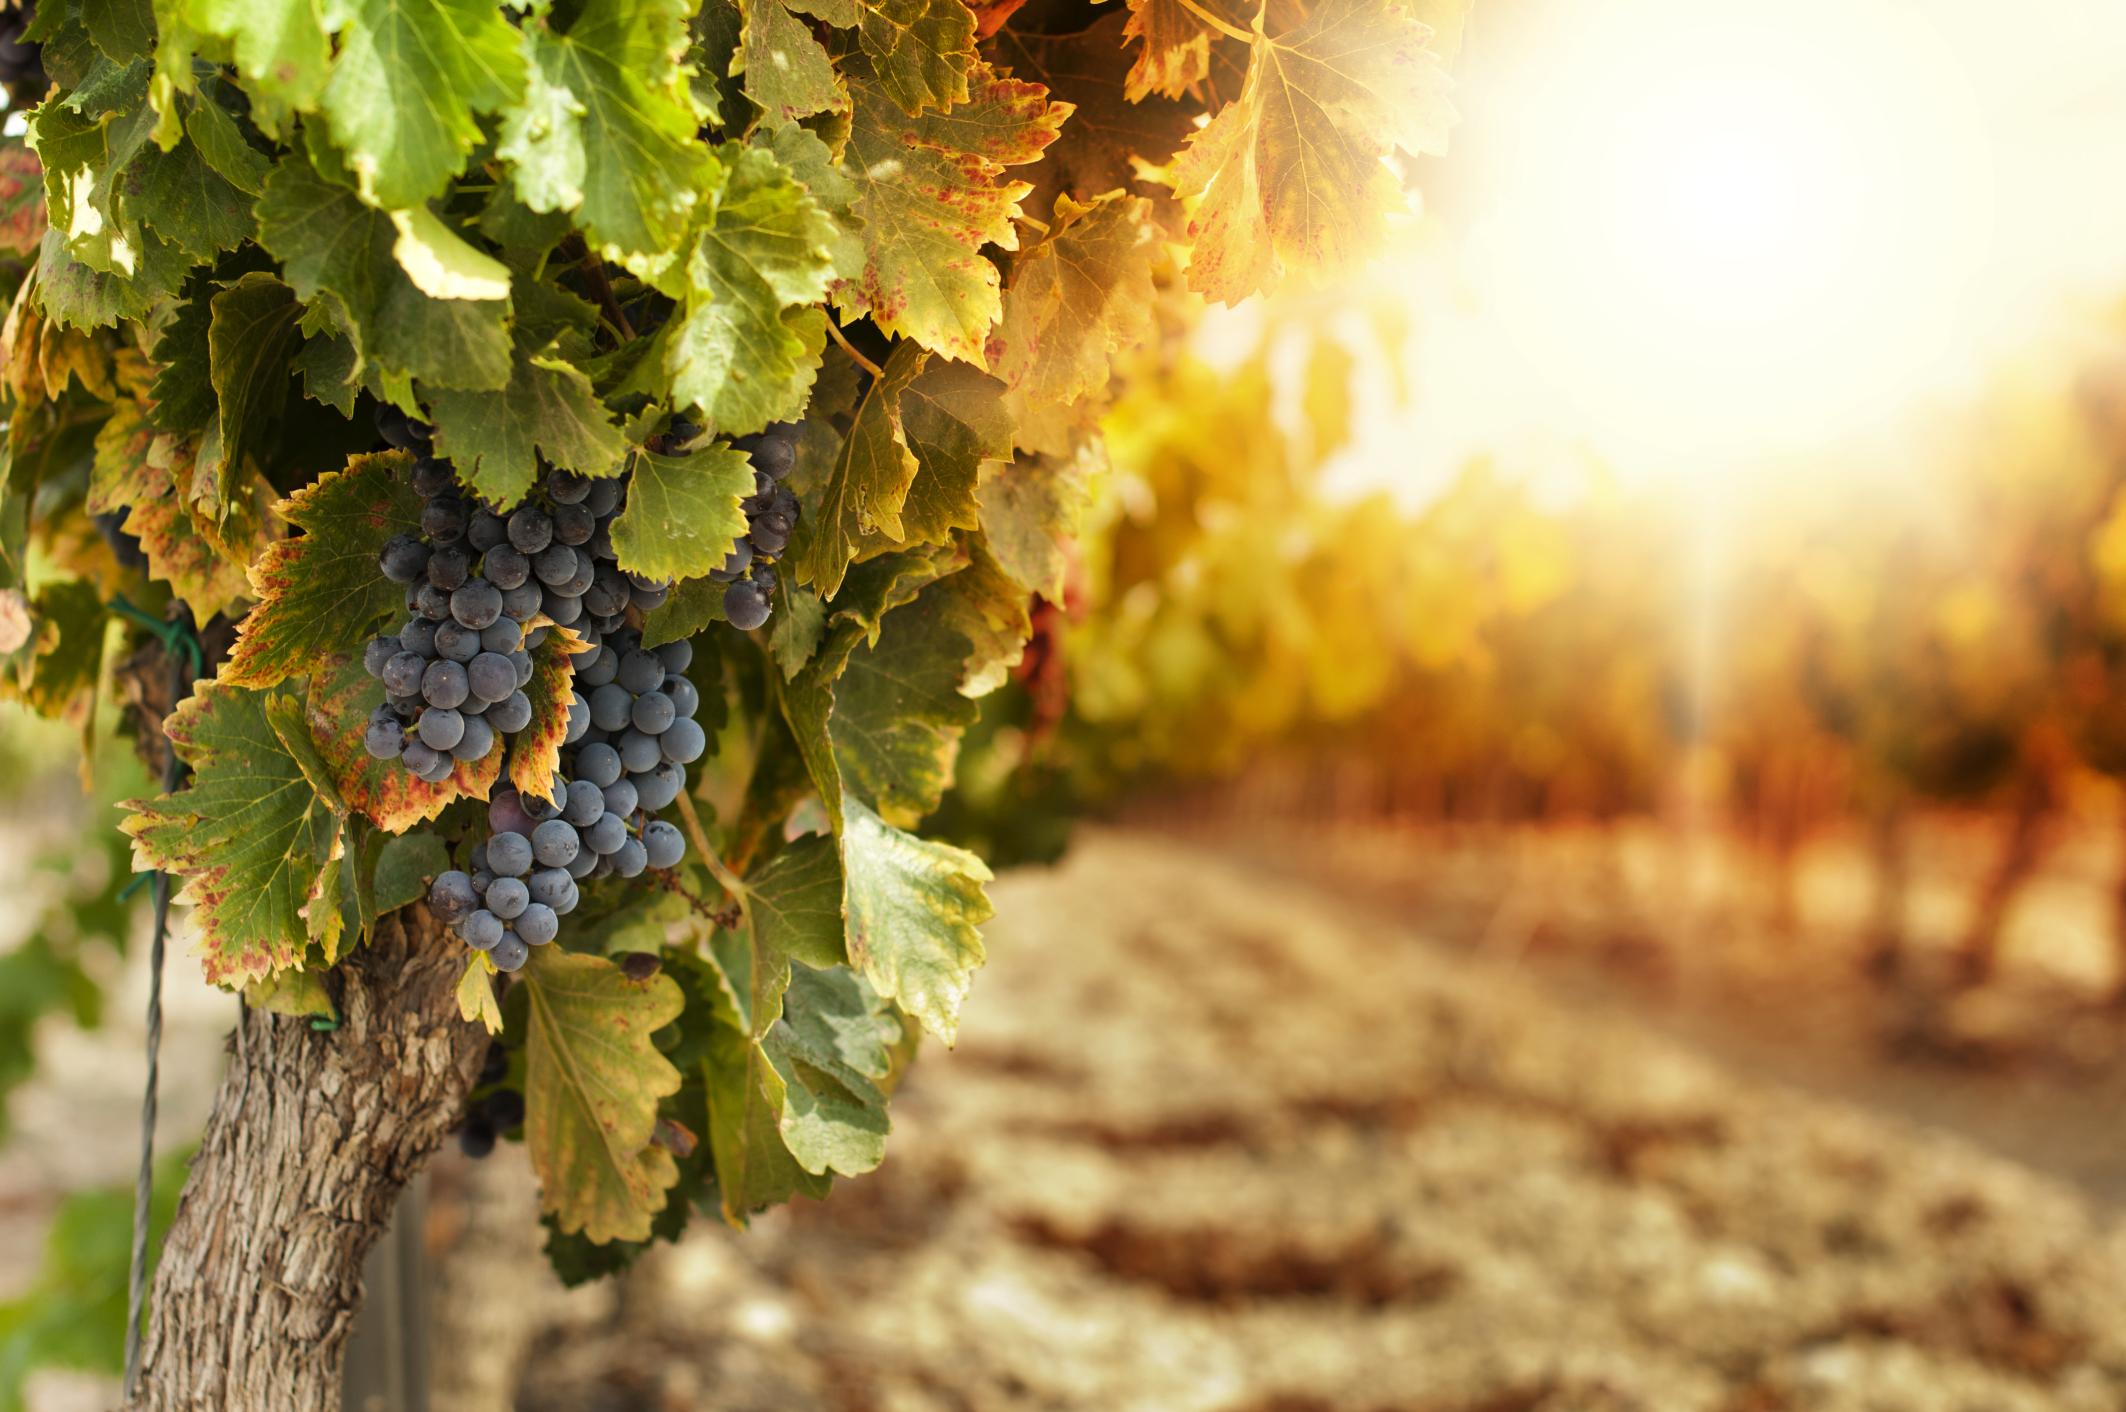 grape vine, vineyard, grapes, true vine